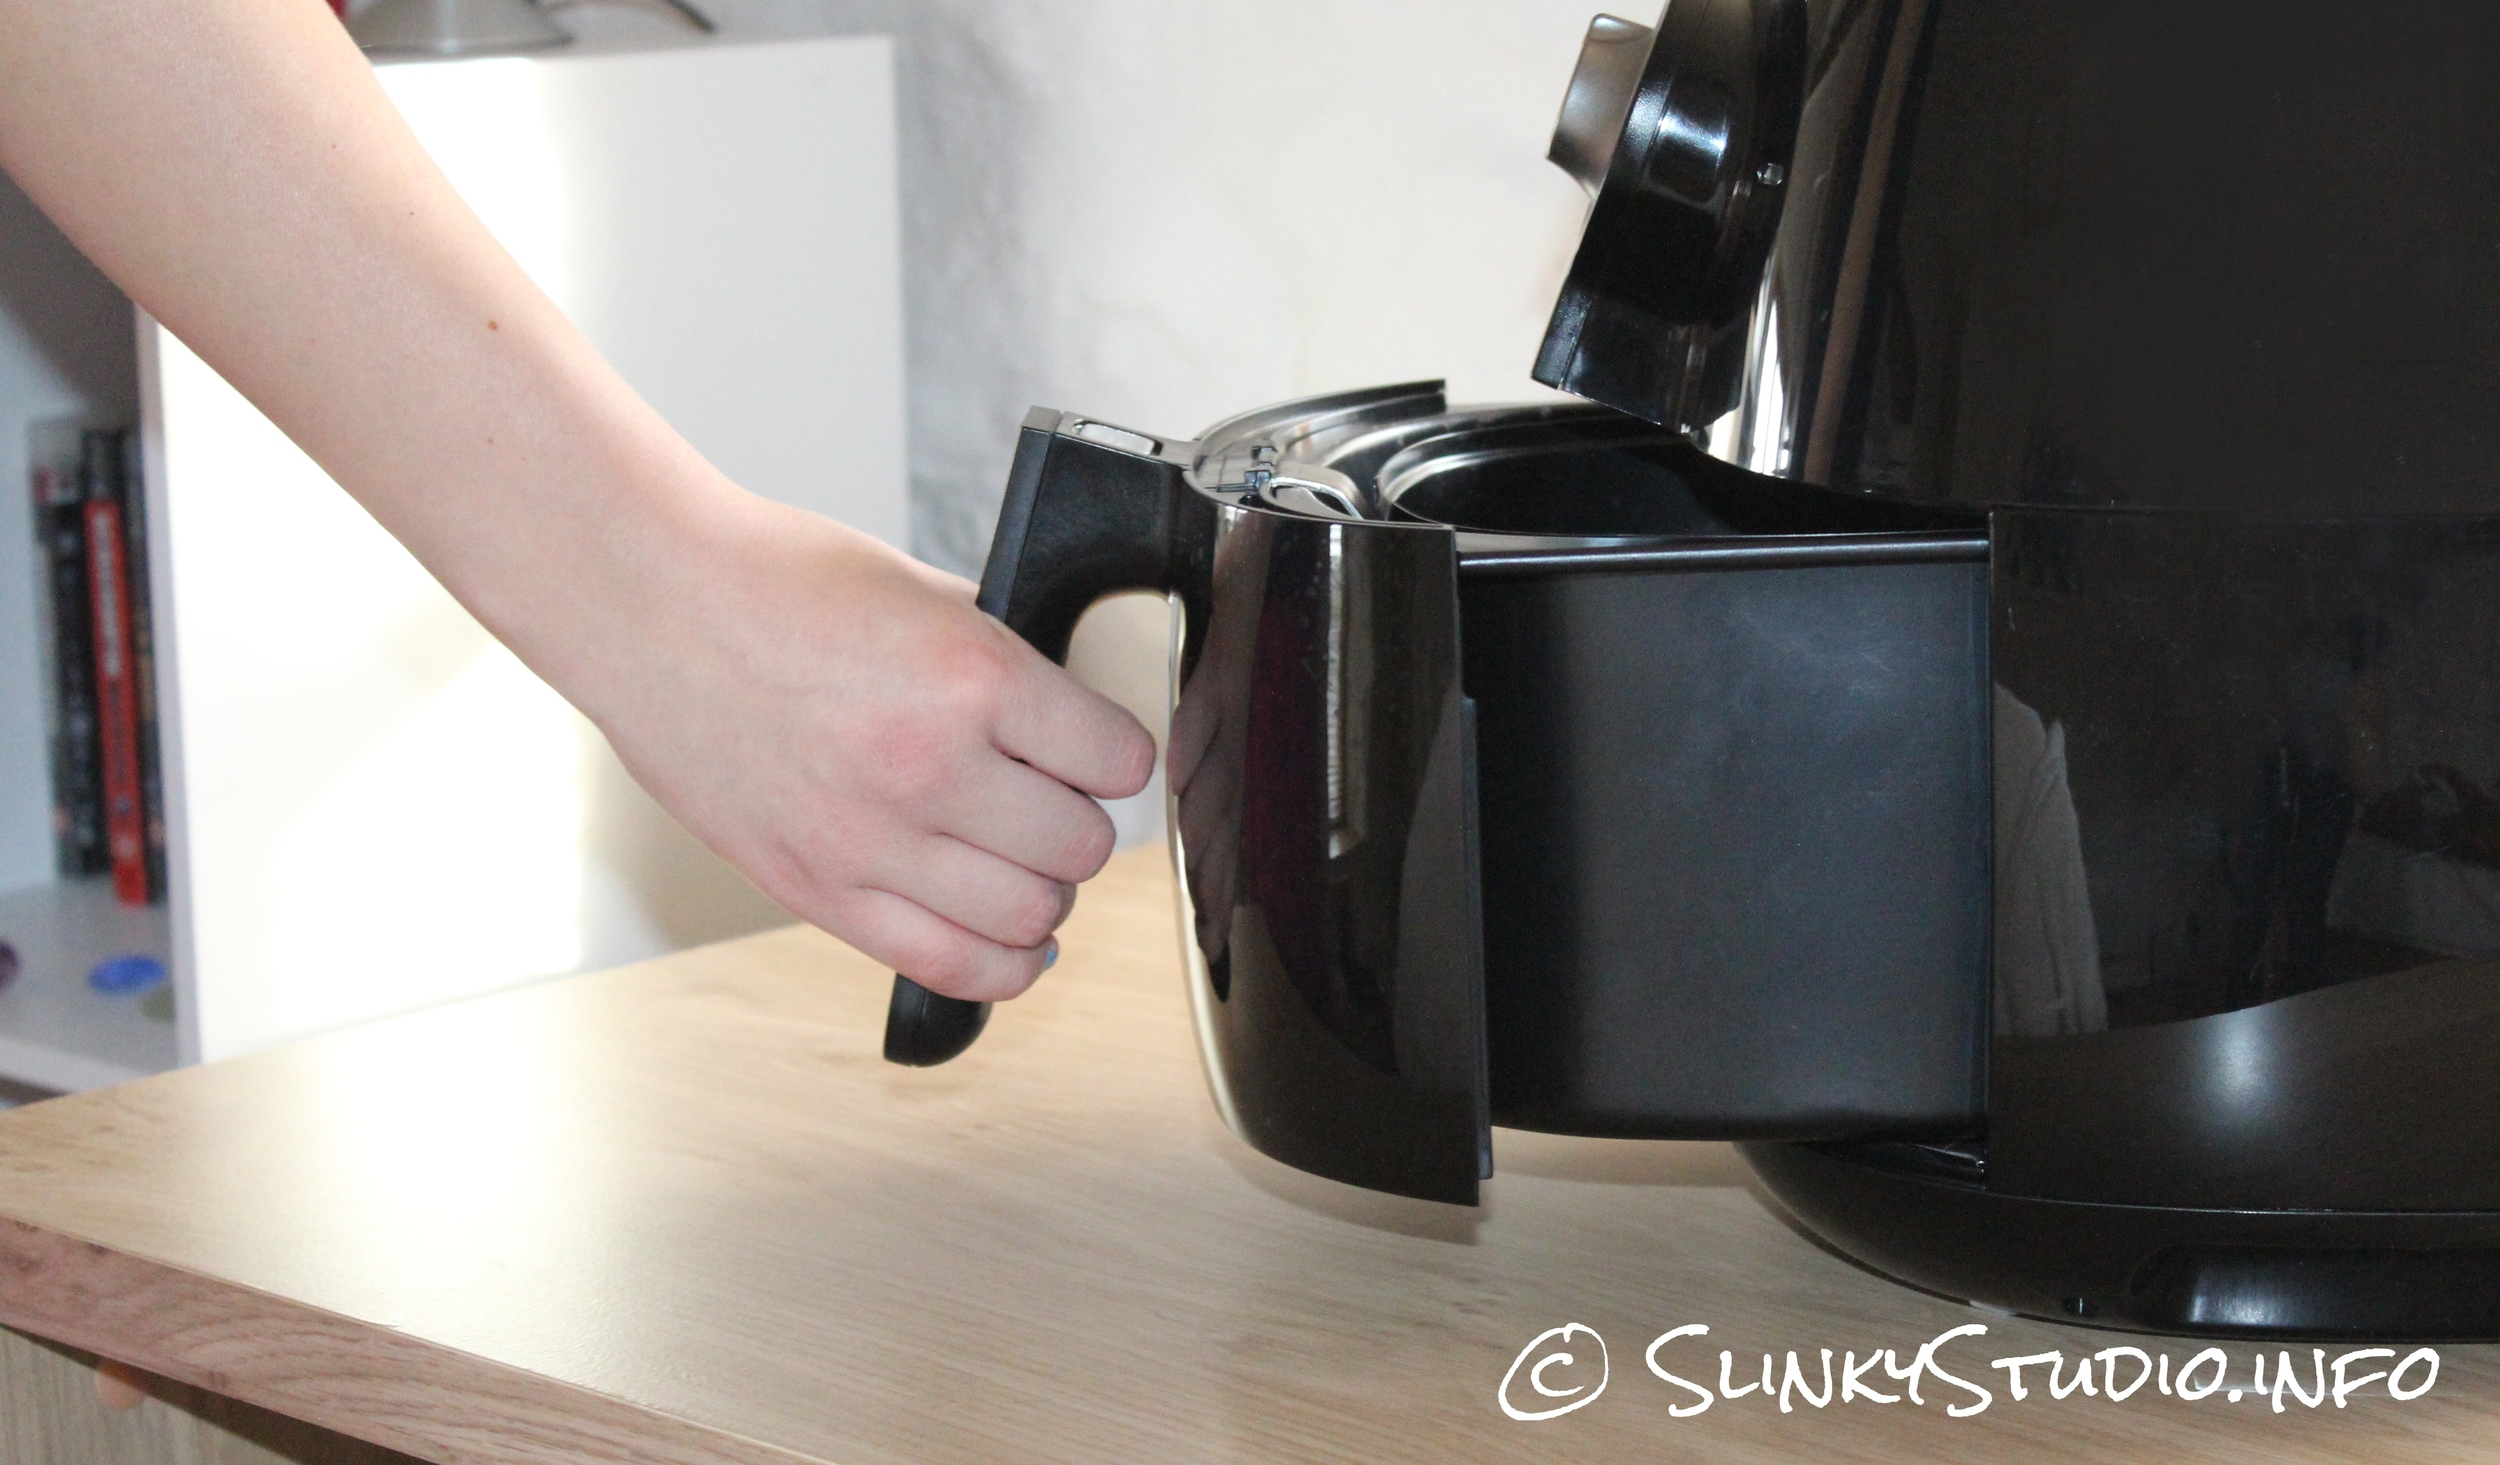 Philips Viva Airfryer Black Basket Being Removed